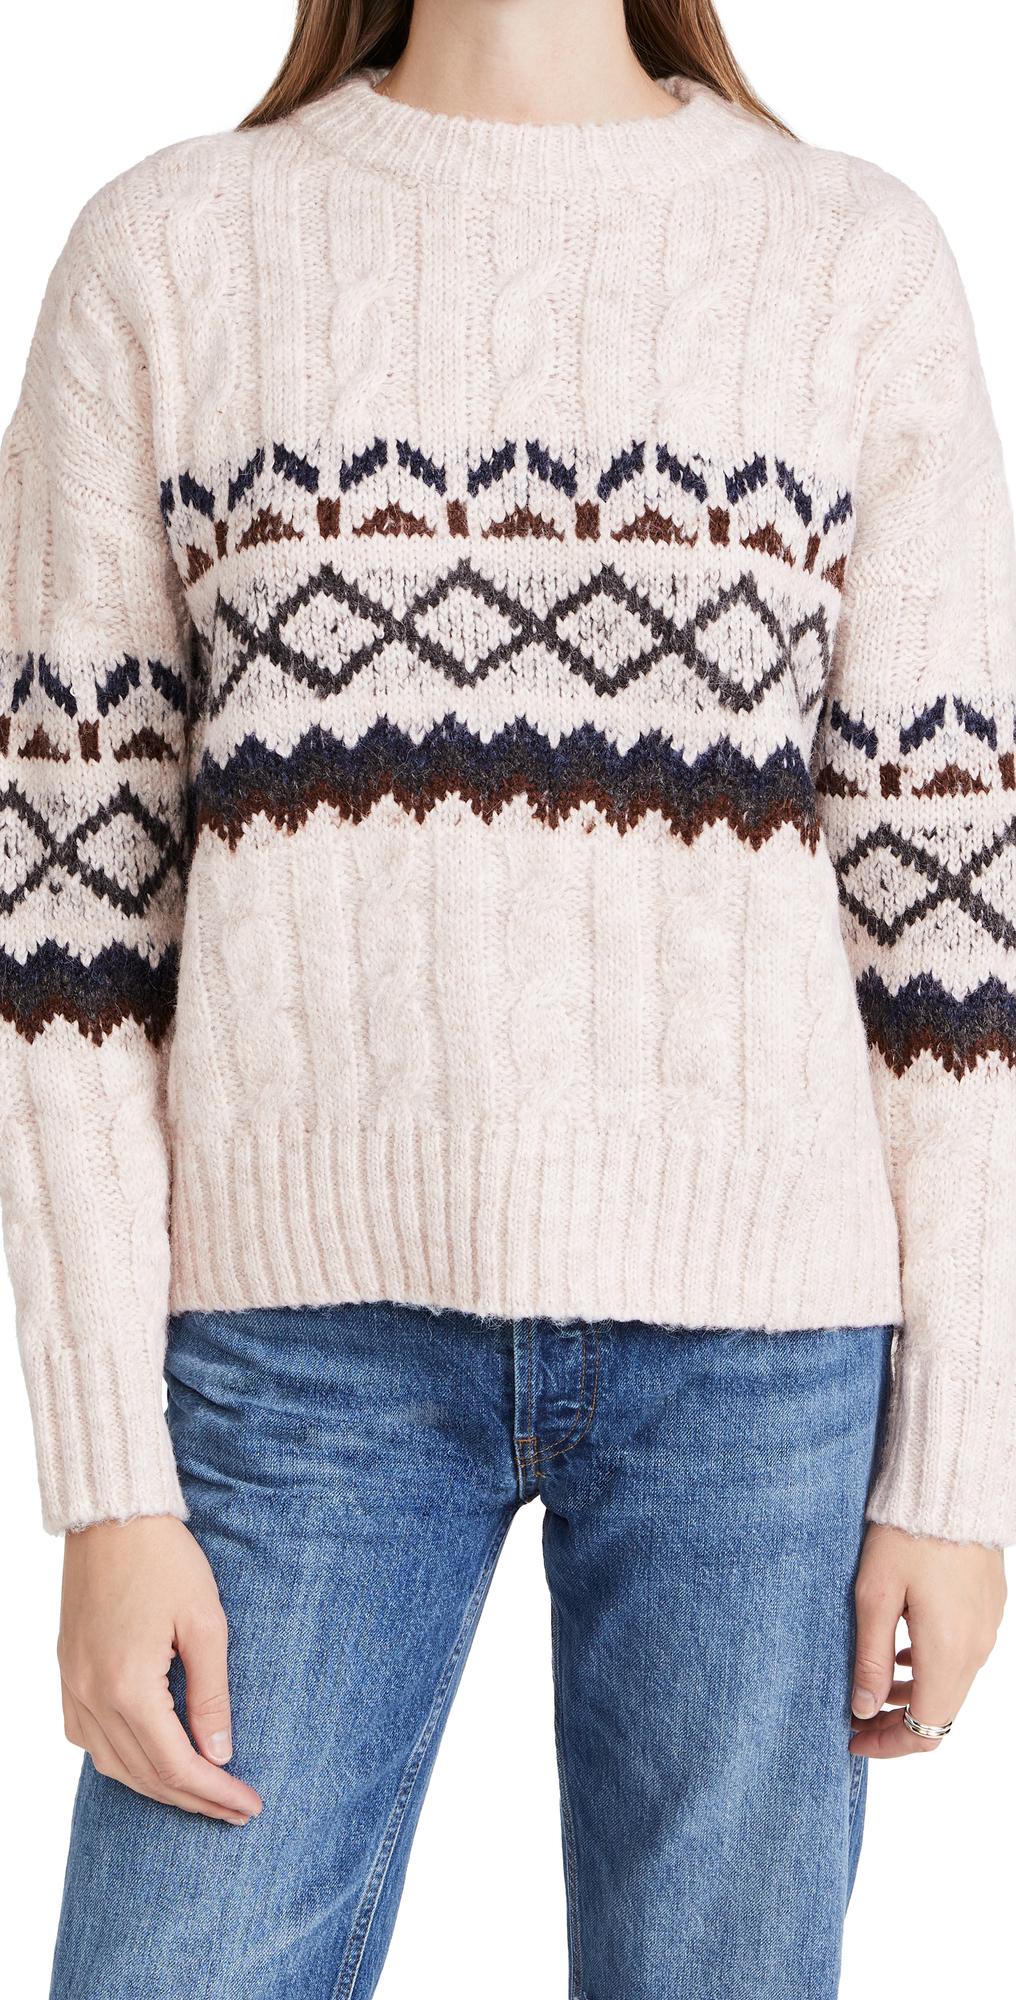 Noah Fair Isle Cable Knit Sweater